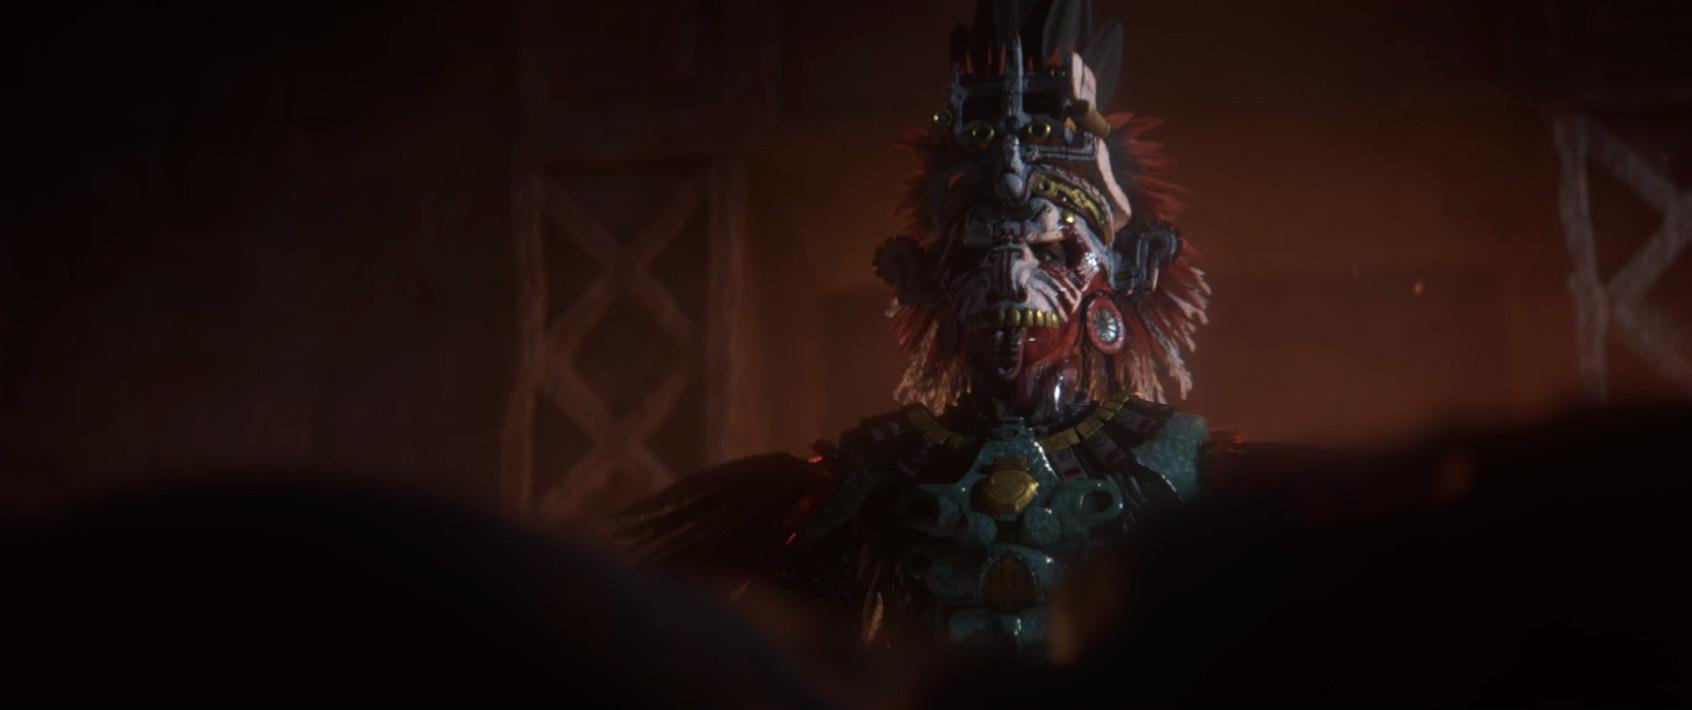 shadow-tomb-raider-end-of-beginning-trailer15